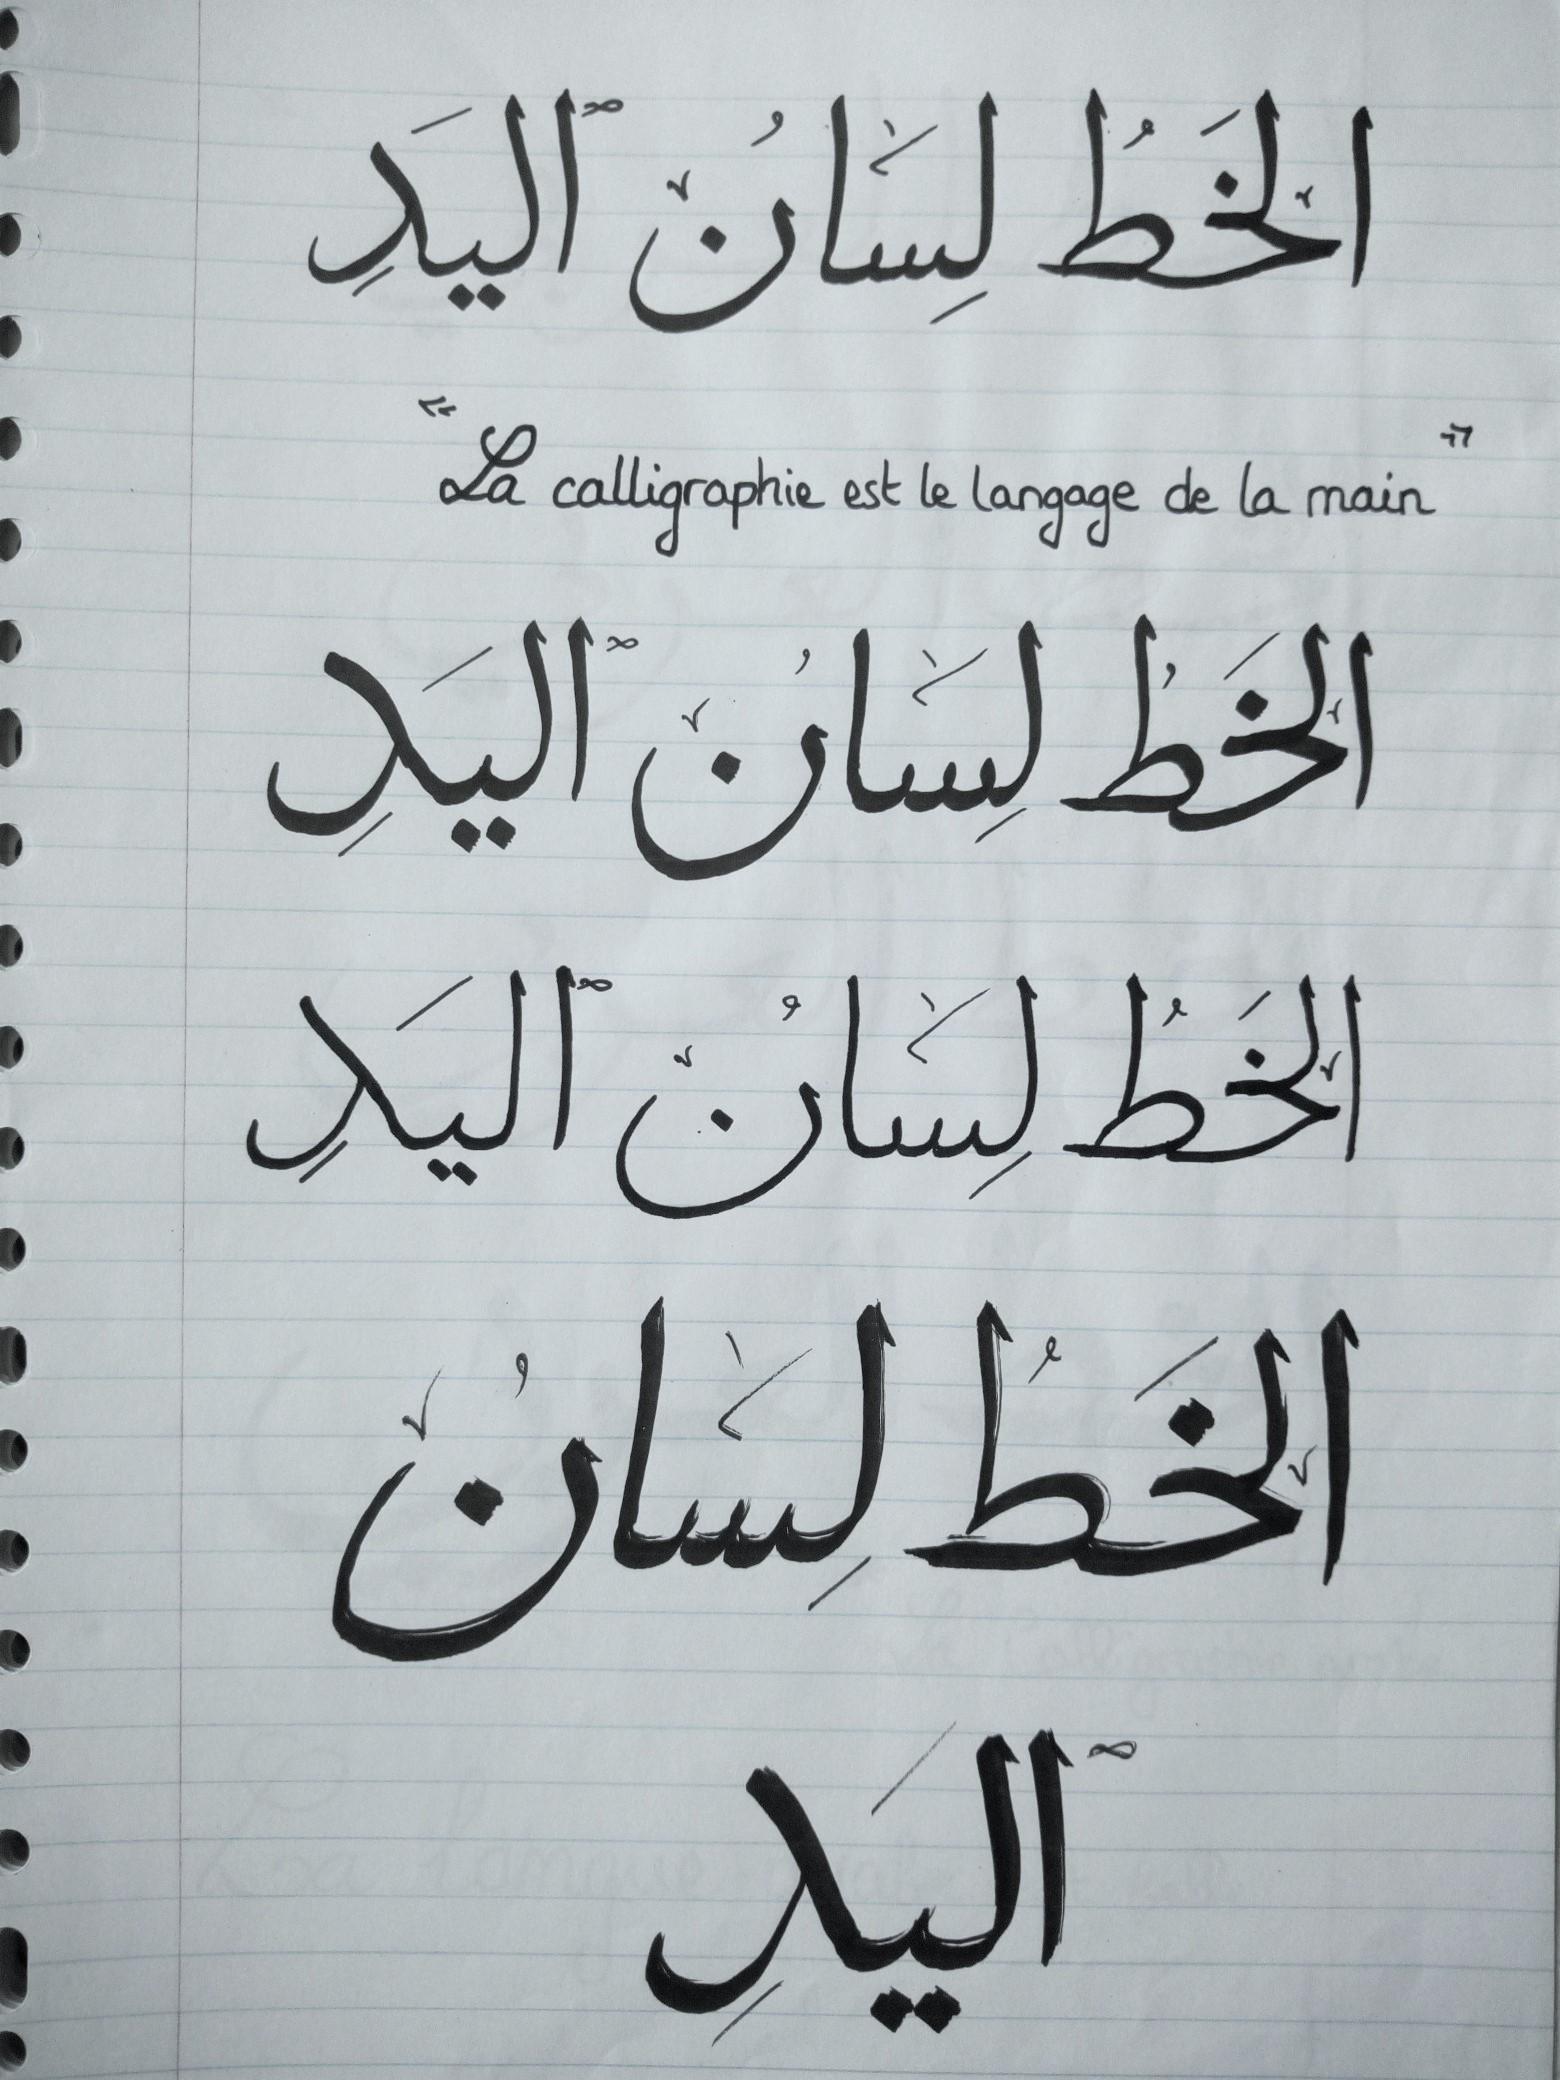 citation en calligraphie arabe